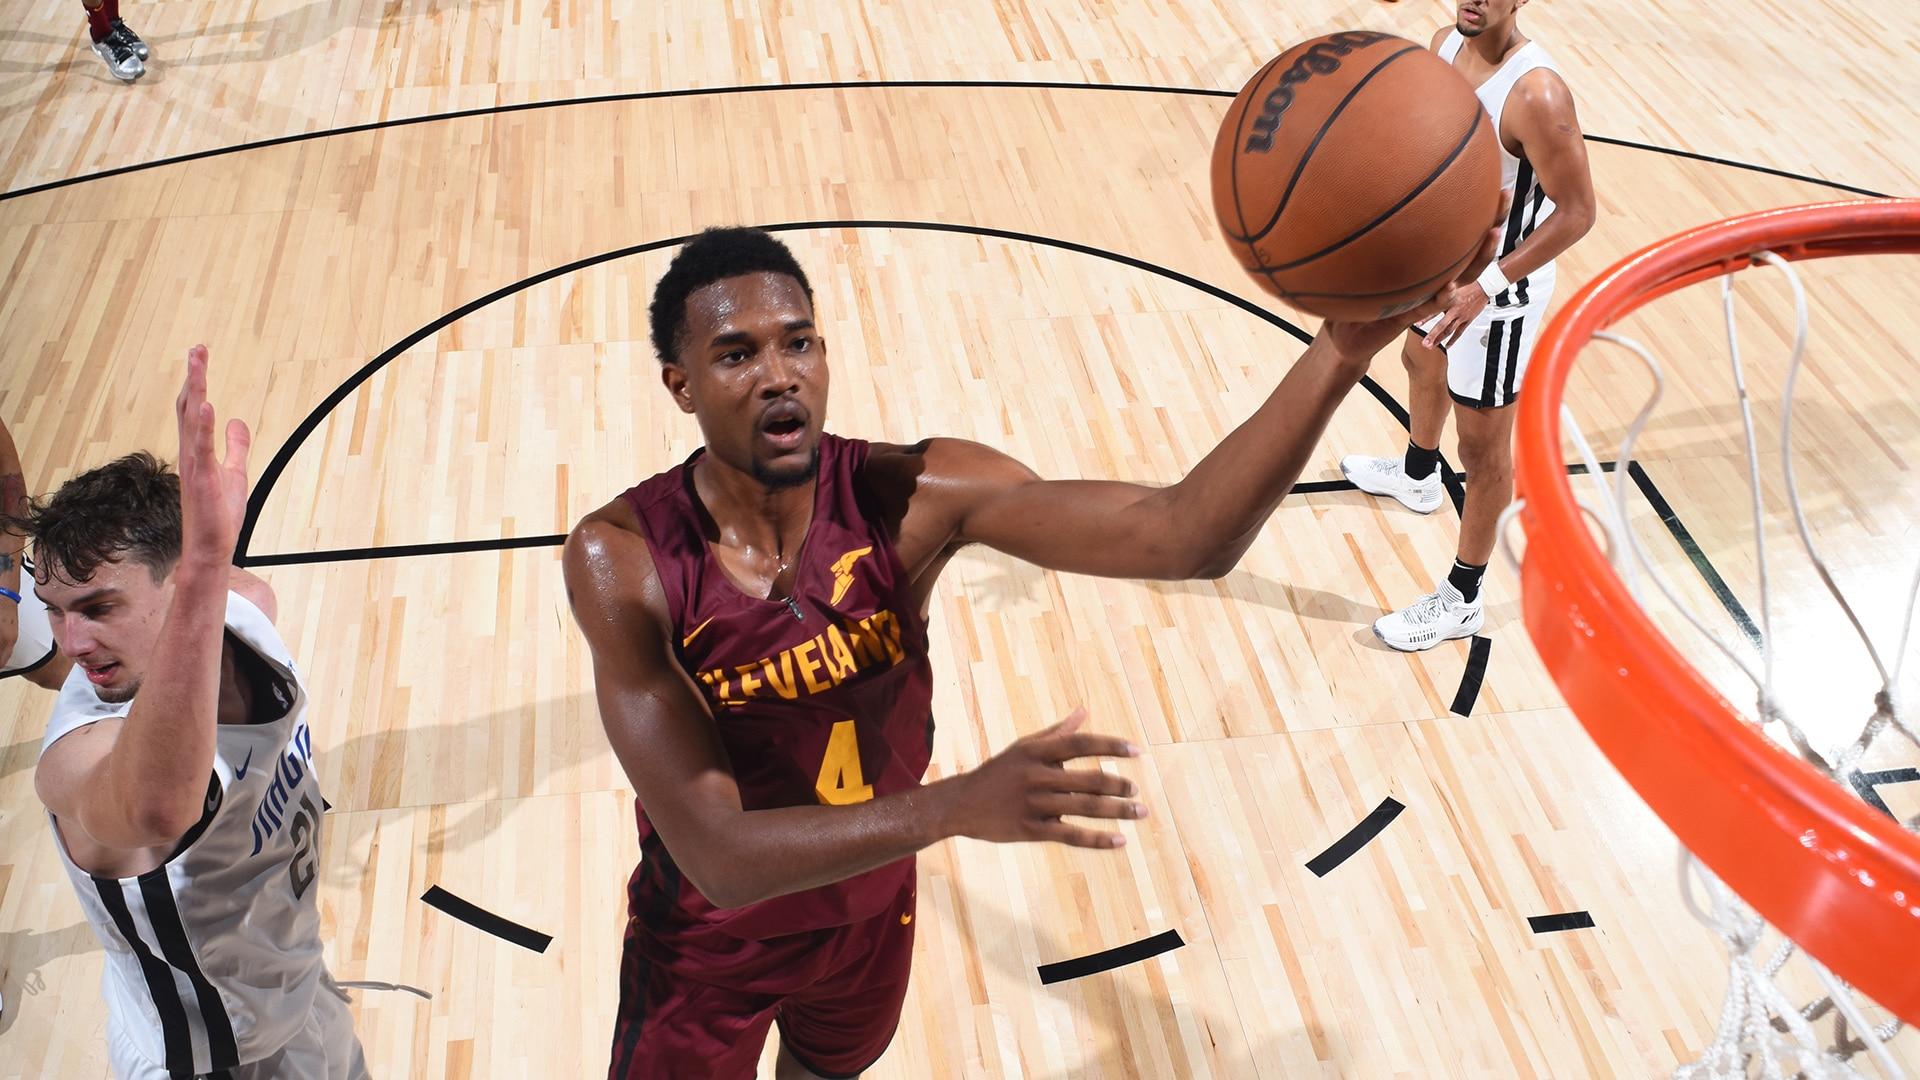 Las Vegas Summer League: Cavaliers pull away in 2nd half to drop Magic